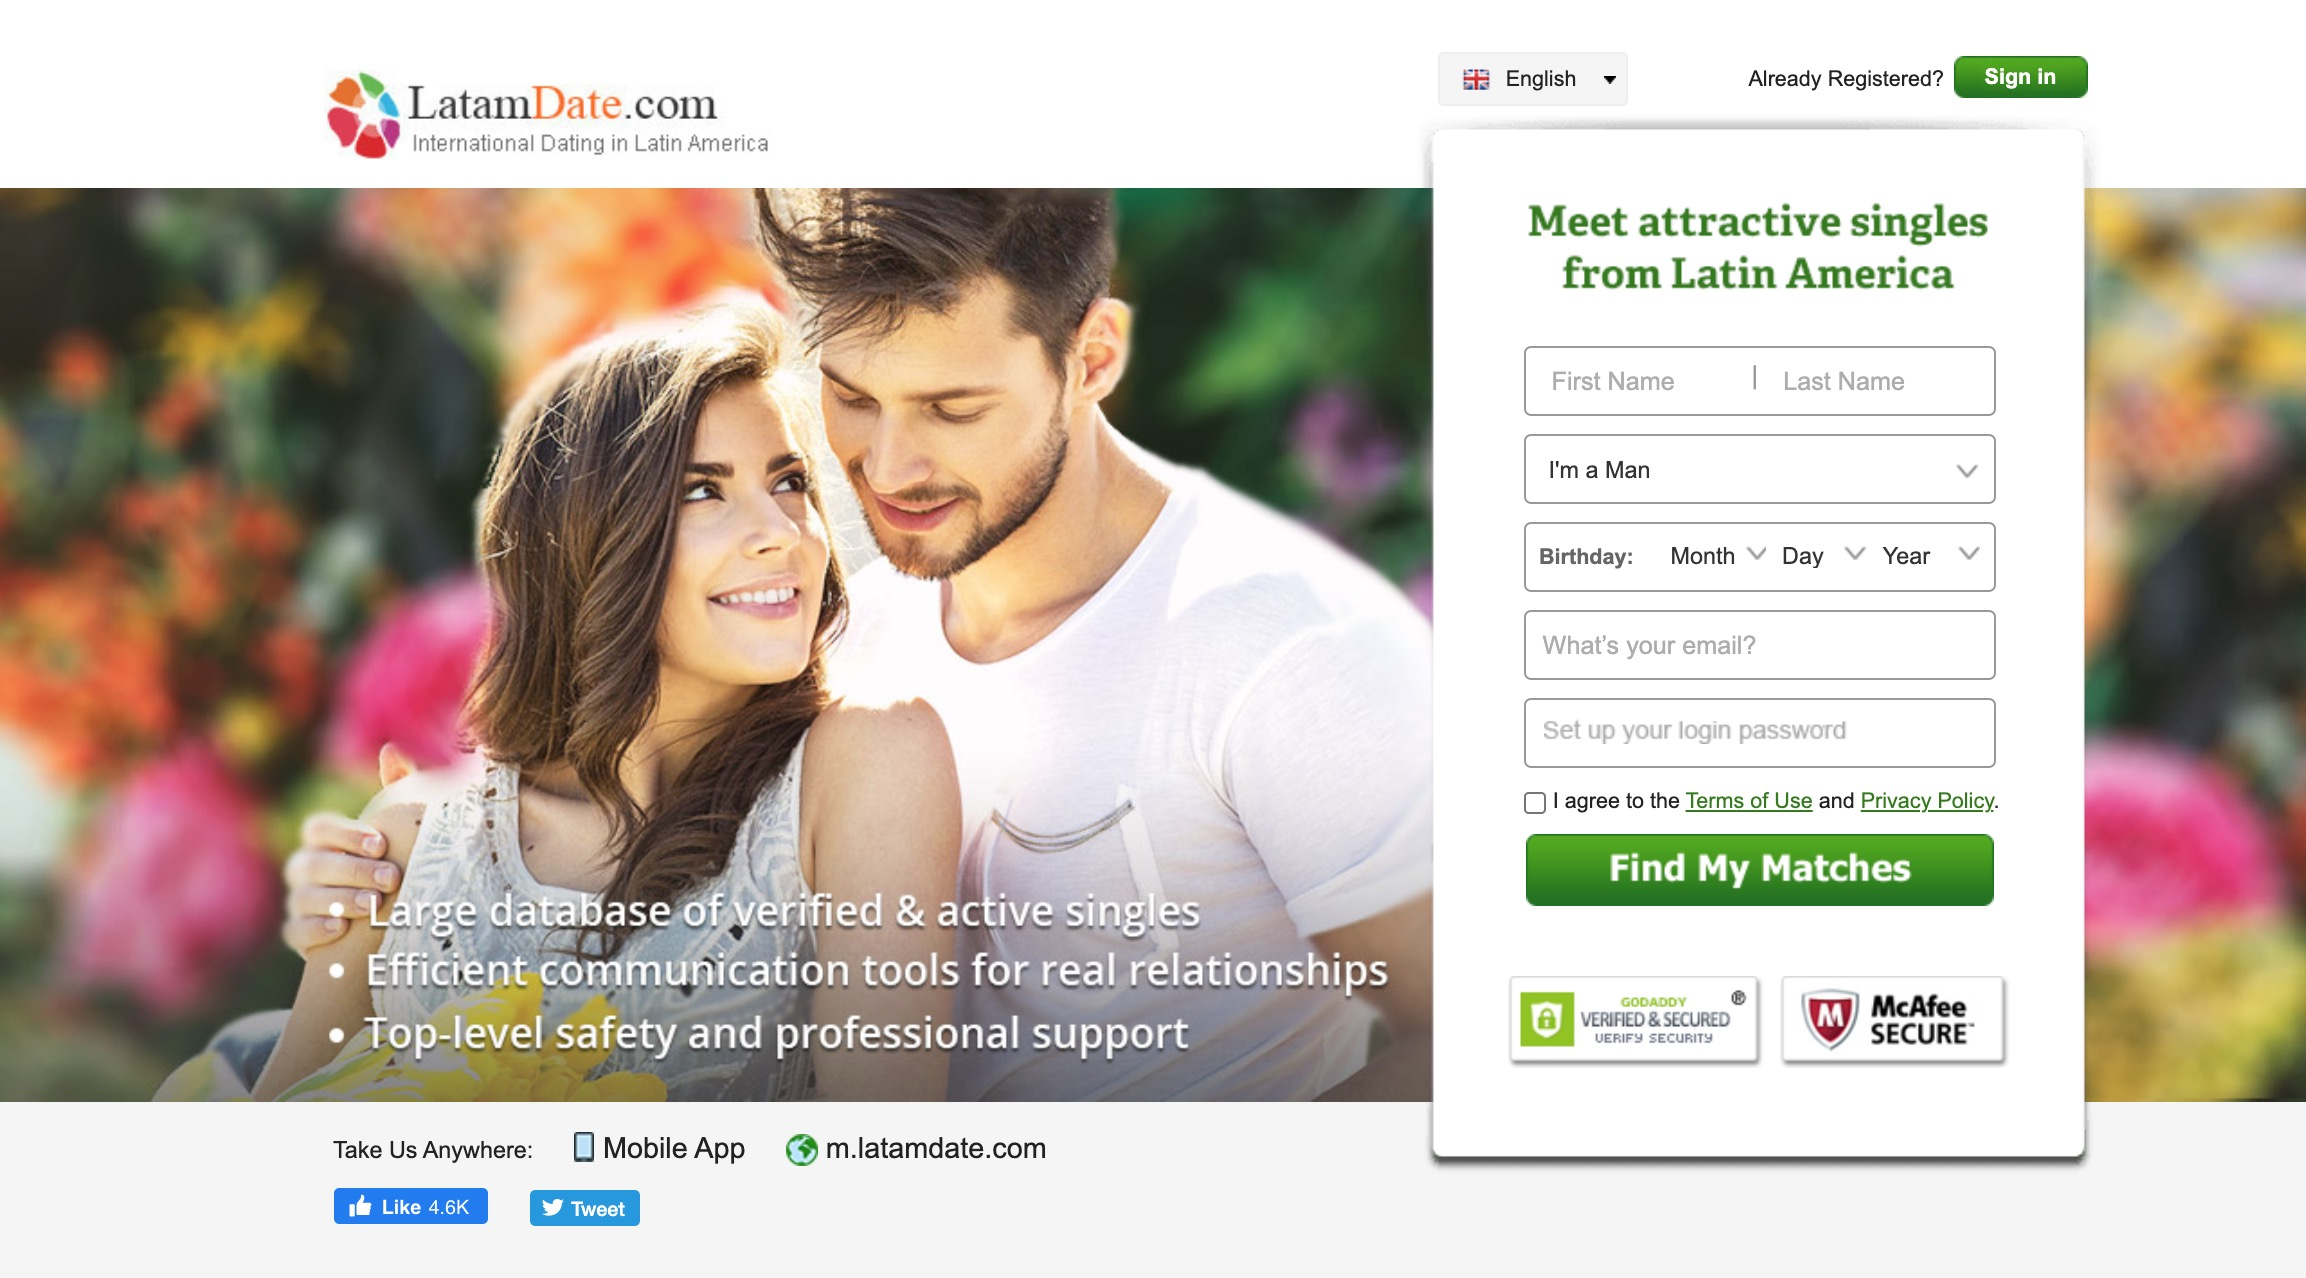 LatamDate main page